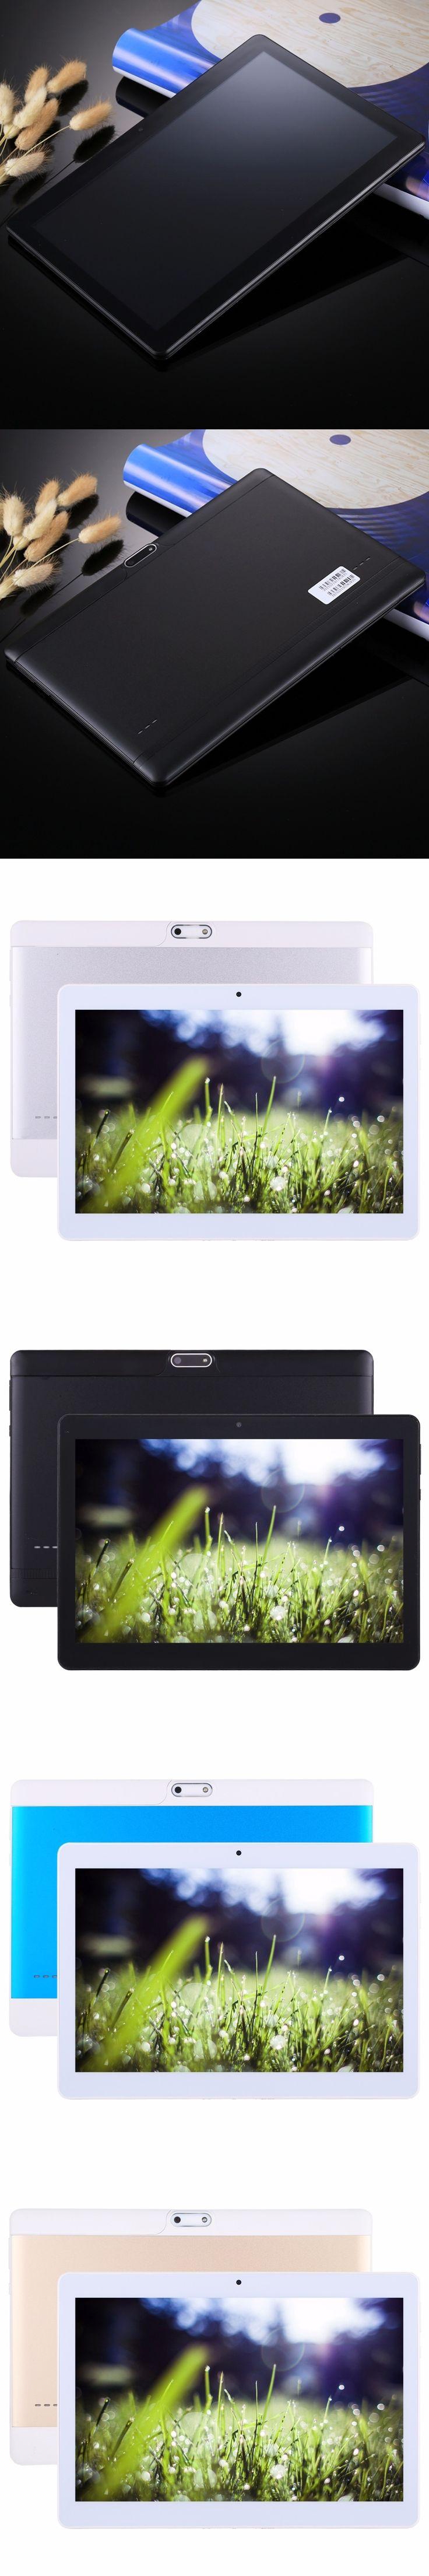 "10.1"" 3G Phone Call Tablet PC 1GB 16GB / 2GB 32GB Android 6.0 10.1 inch Tablet MT6580 Quad Core Support OTG GPS FM WiFi Dual SIM"